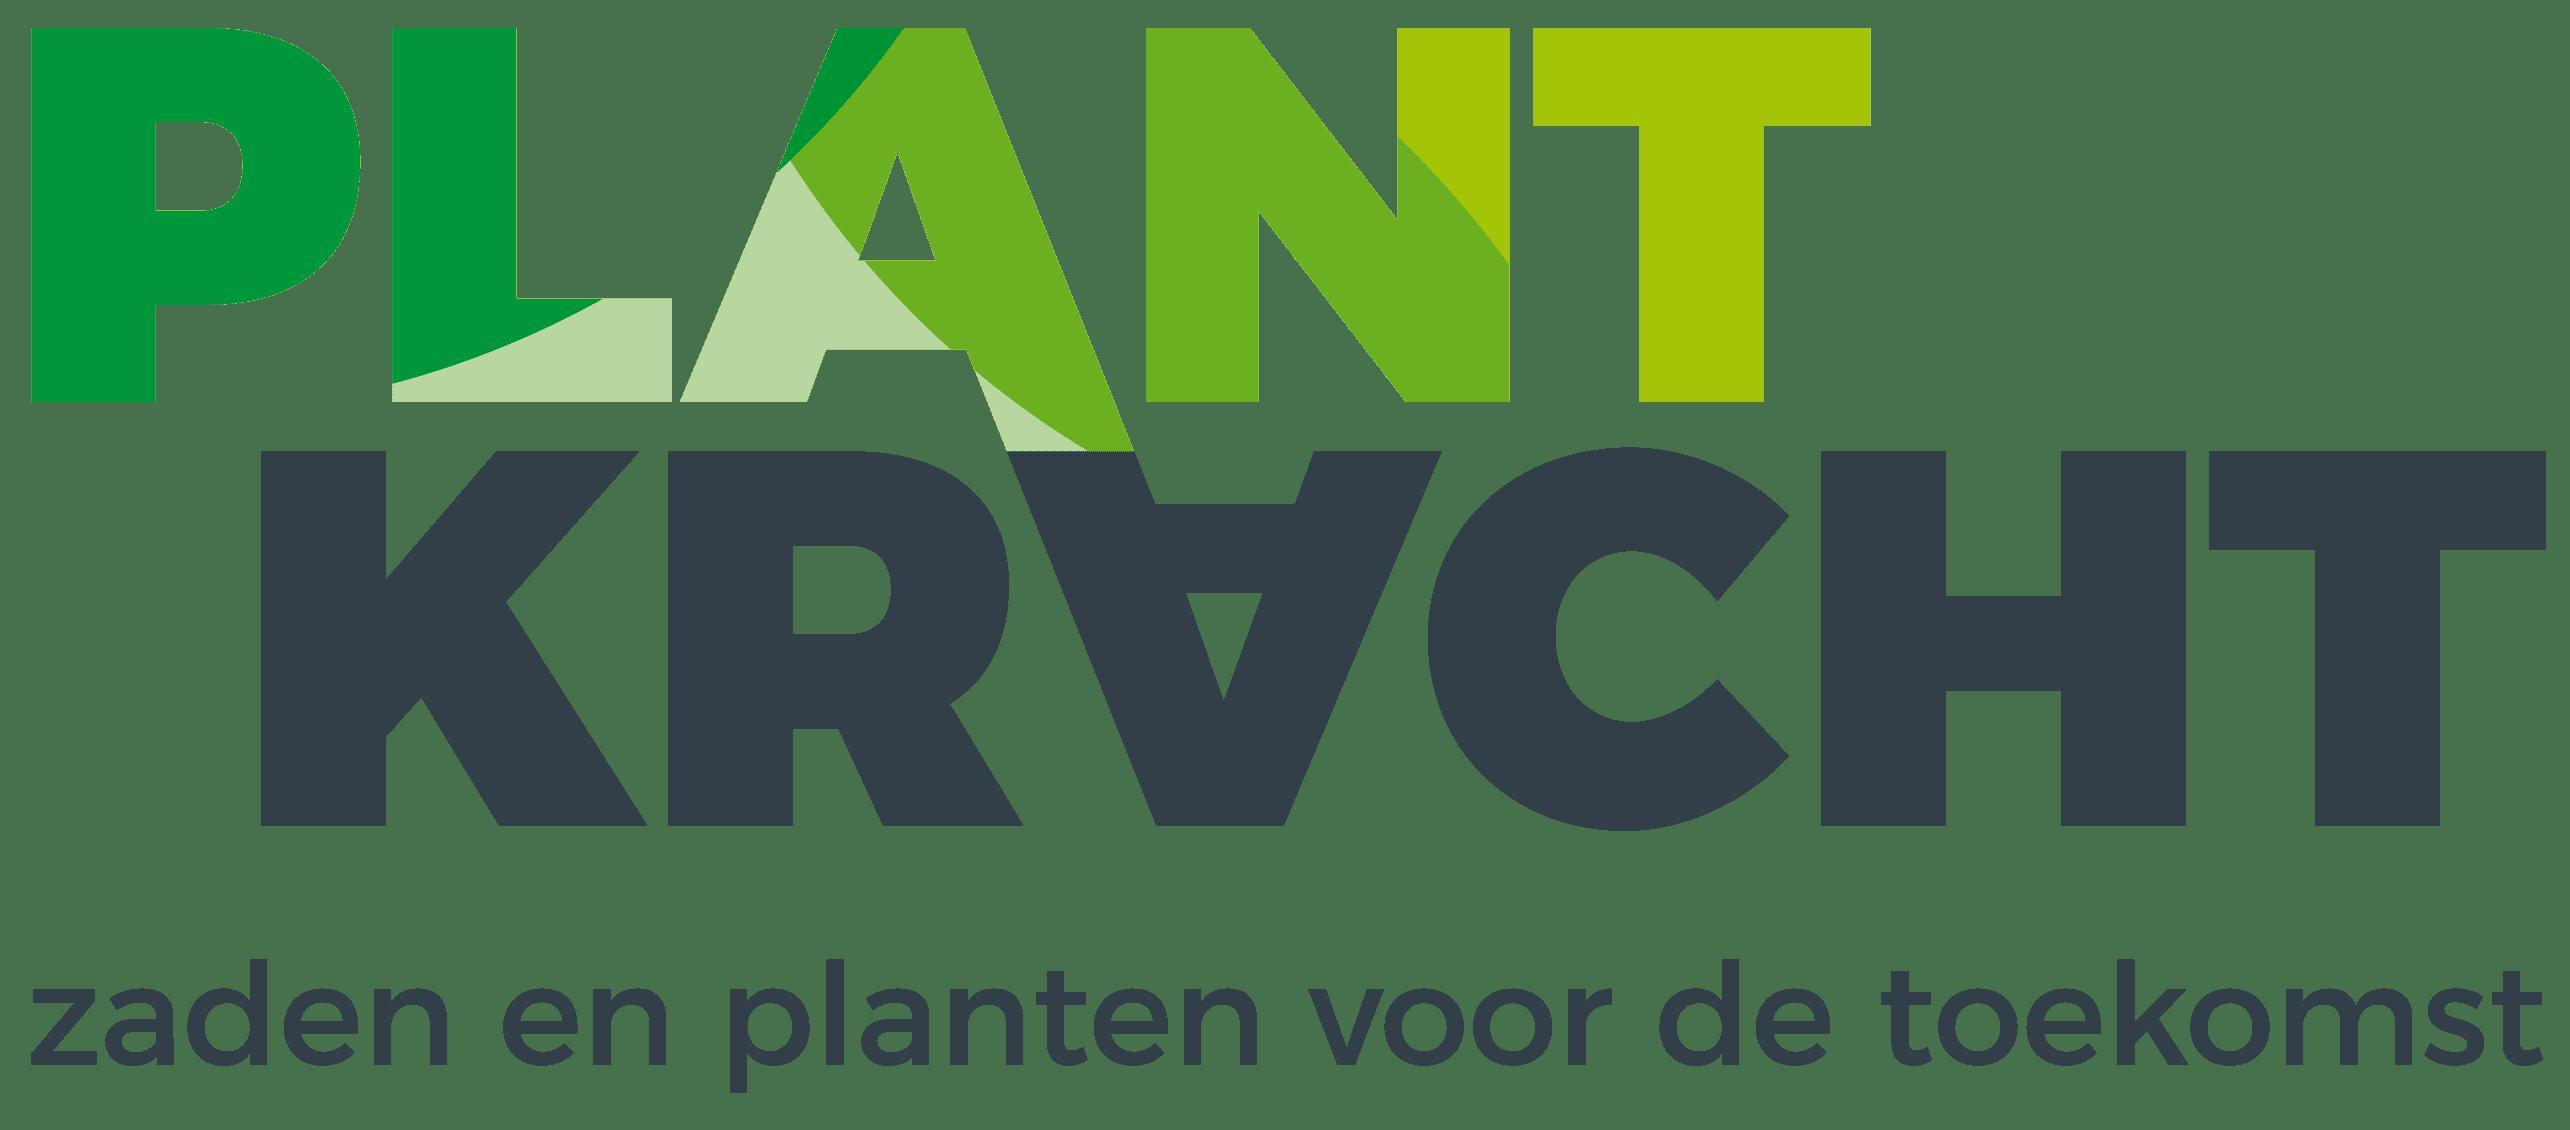 PlantKracht